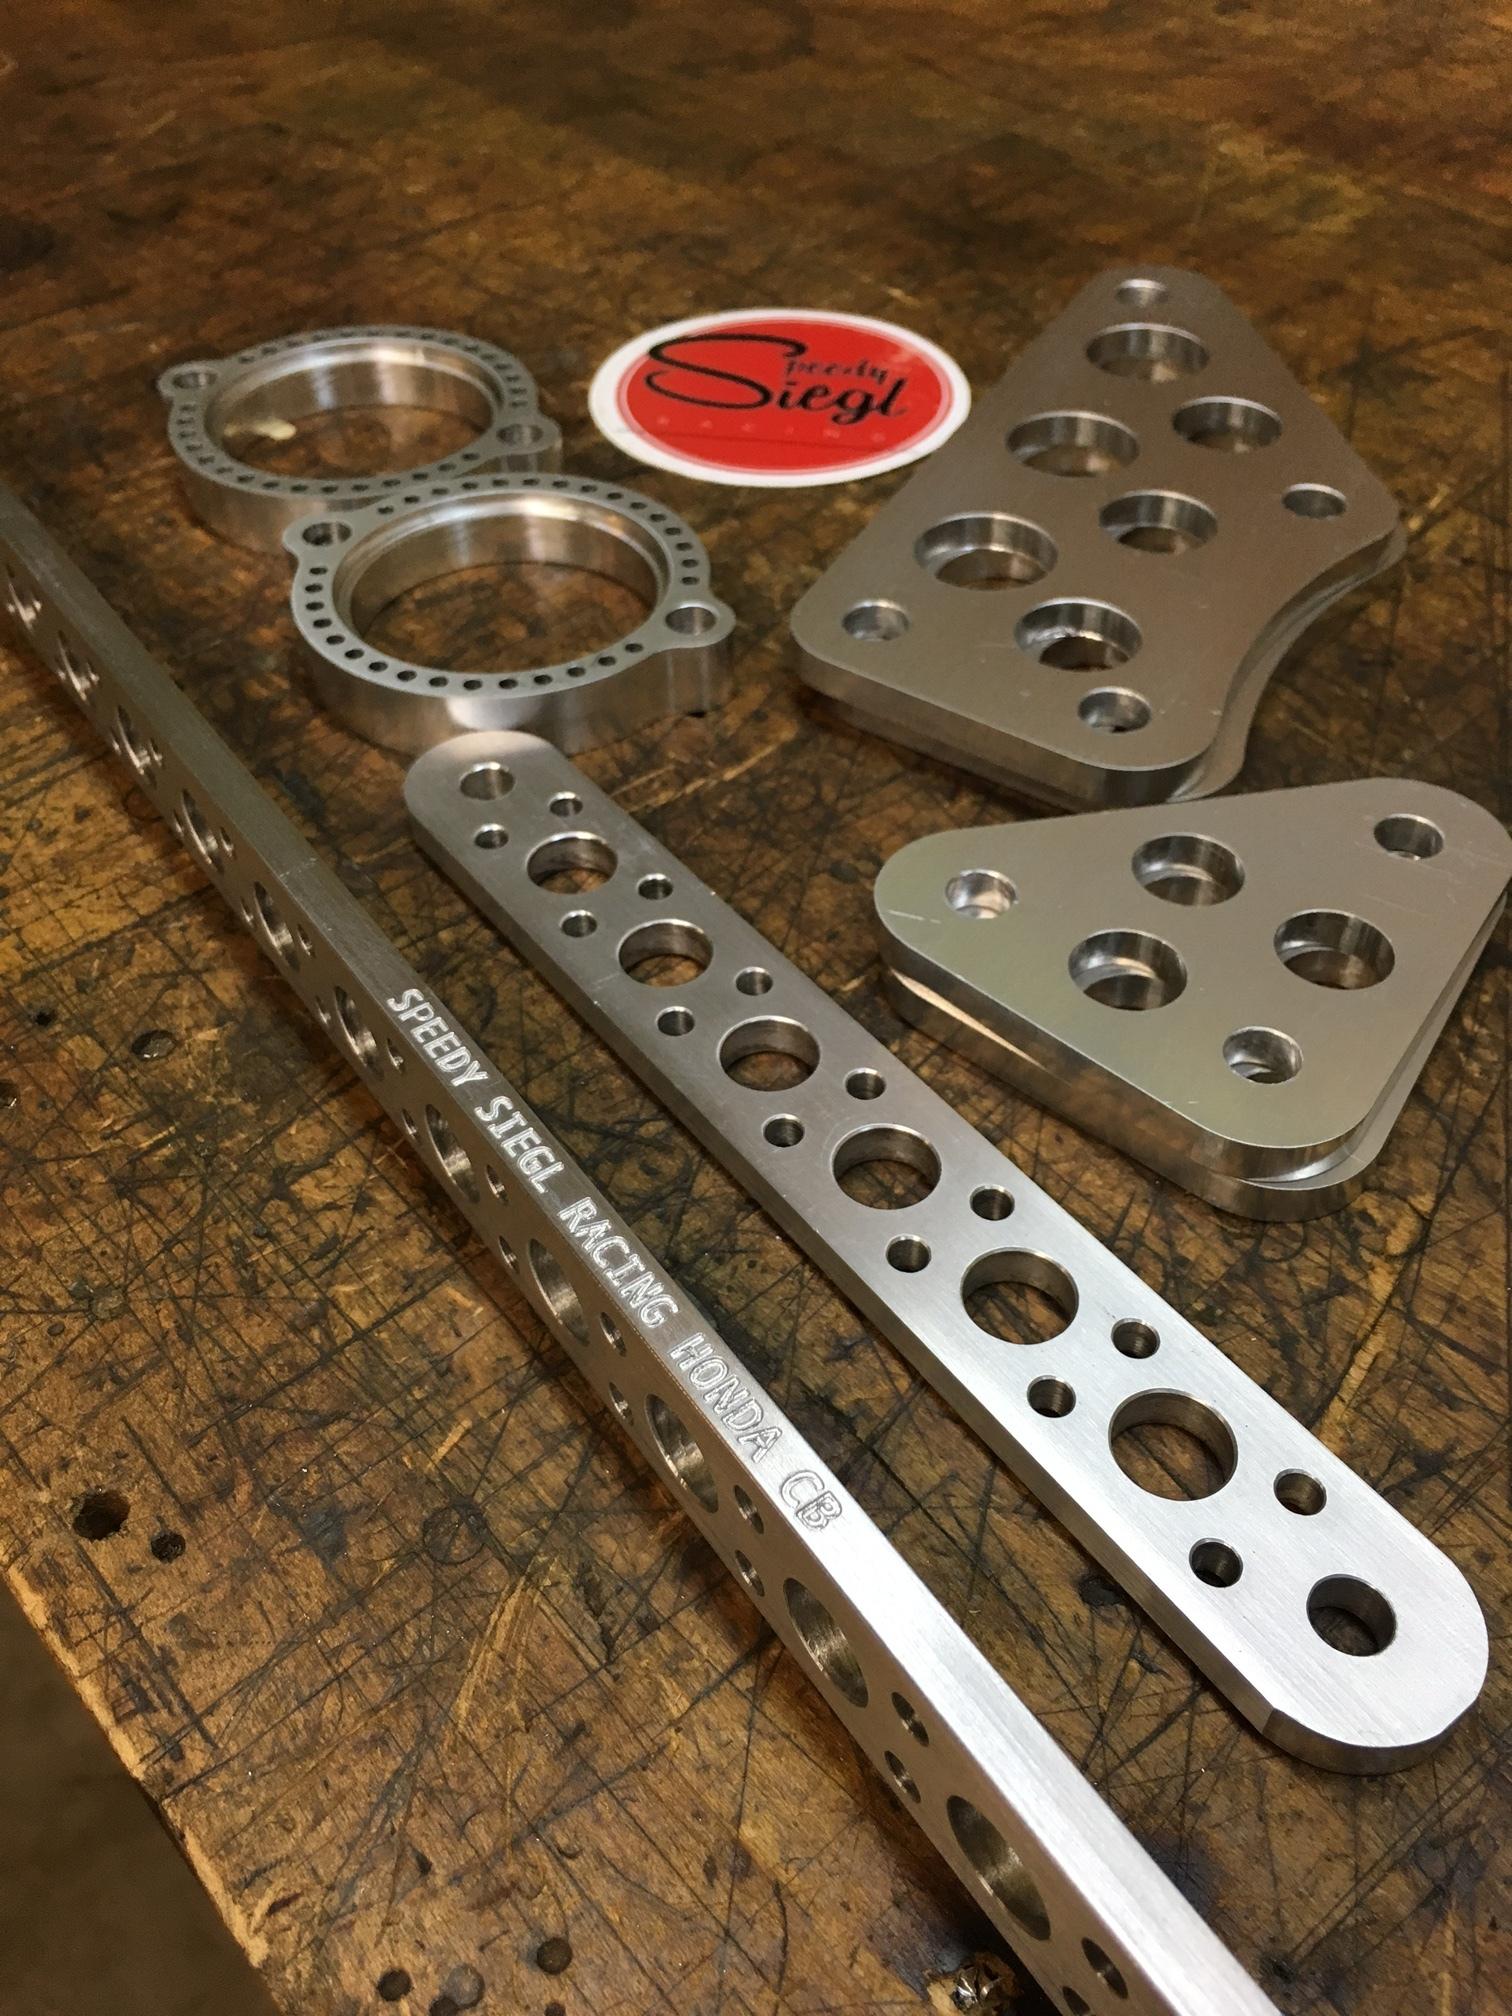 Speedy Siegl racing CB450 CL450 CB500t weight savings lightweight parts package